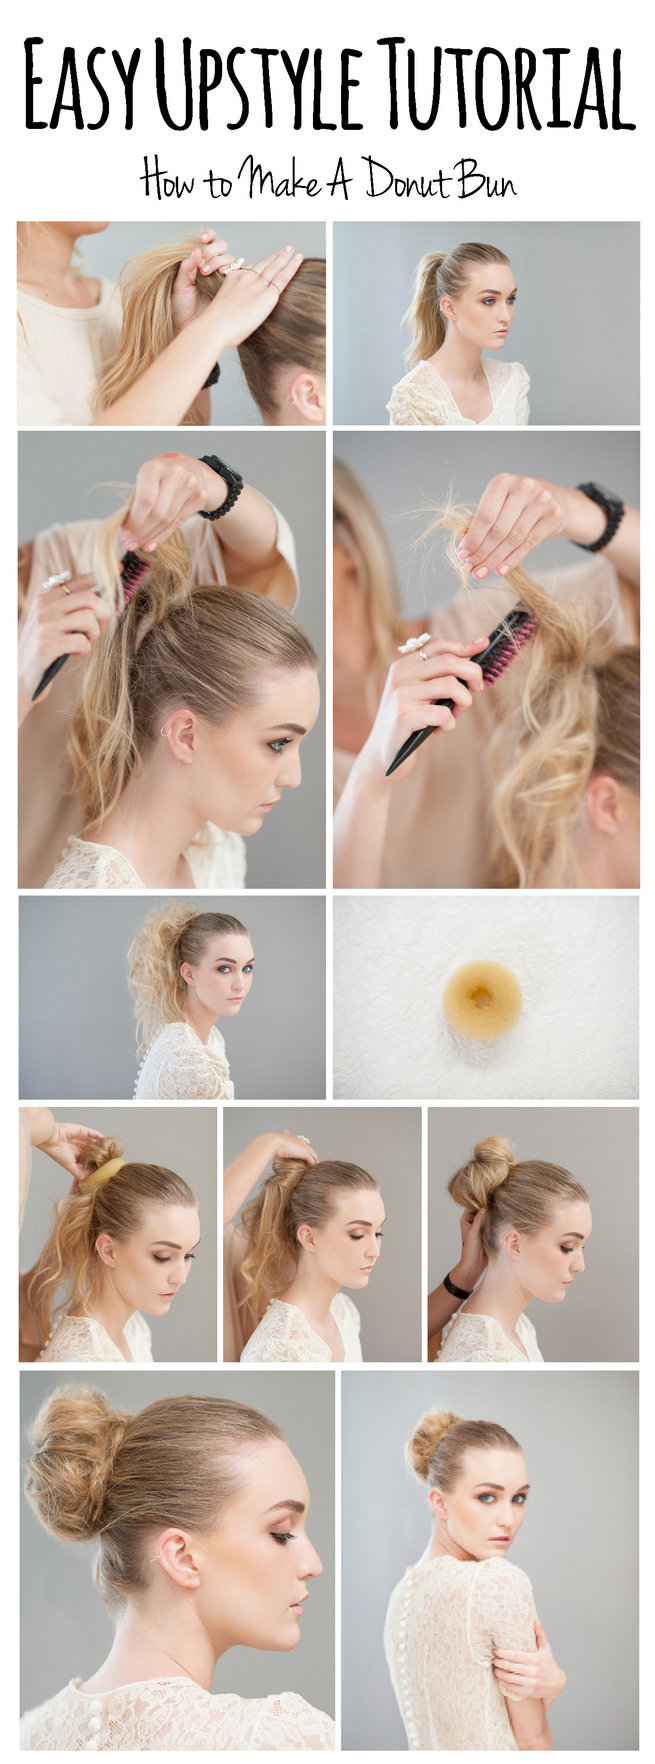 Sensational Deceptive Bun Hairstyles 10 Easier Than They Look Buns Short Hairstyles Gunalazisus